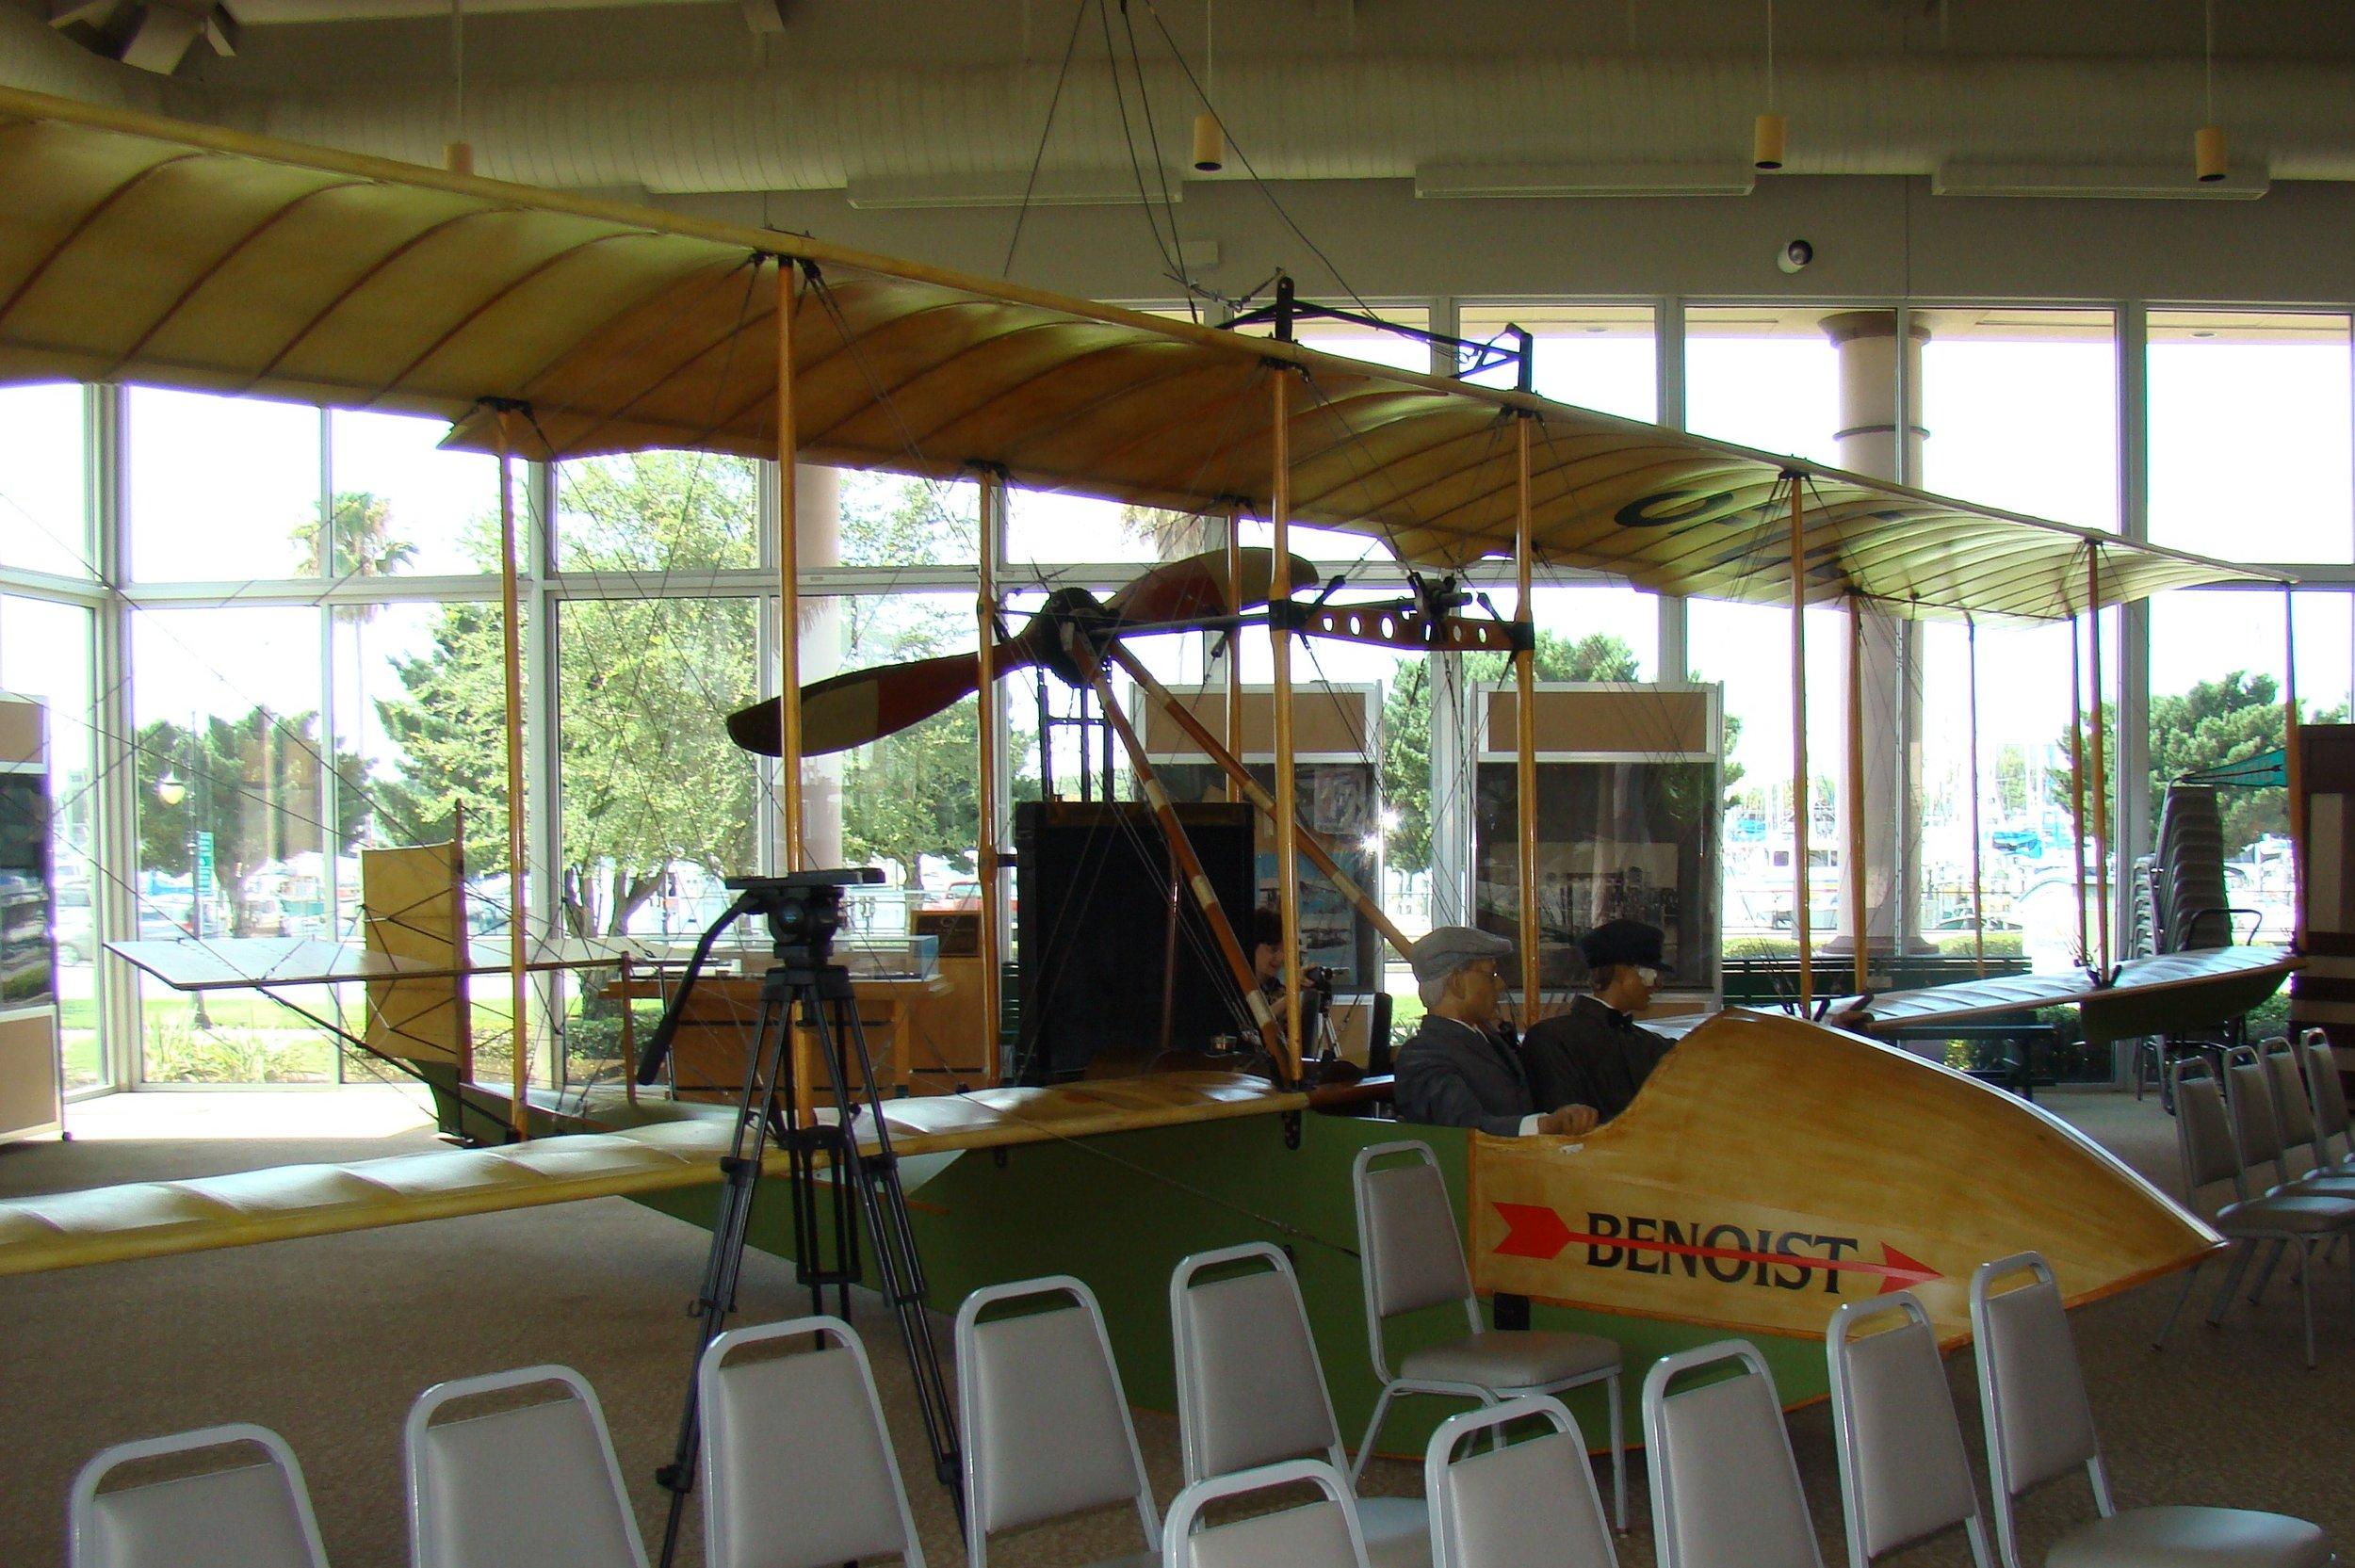 Benoist Airboat on Floor @ SPMOH, 14 Jun '12.JPG